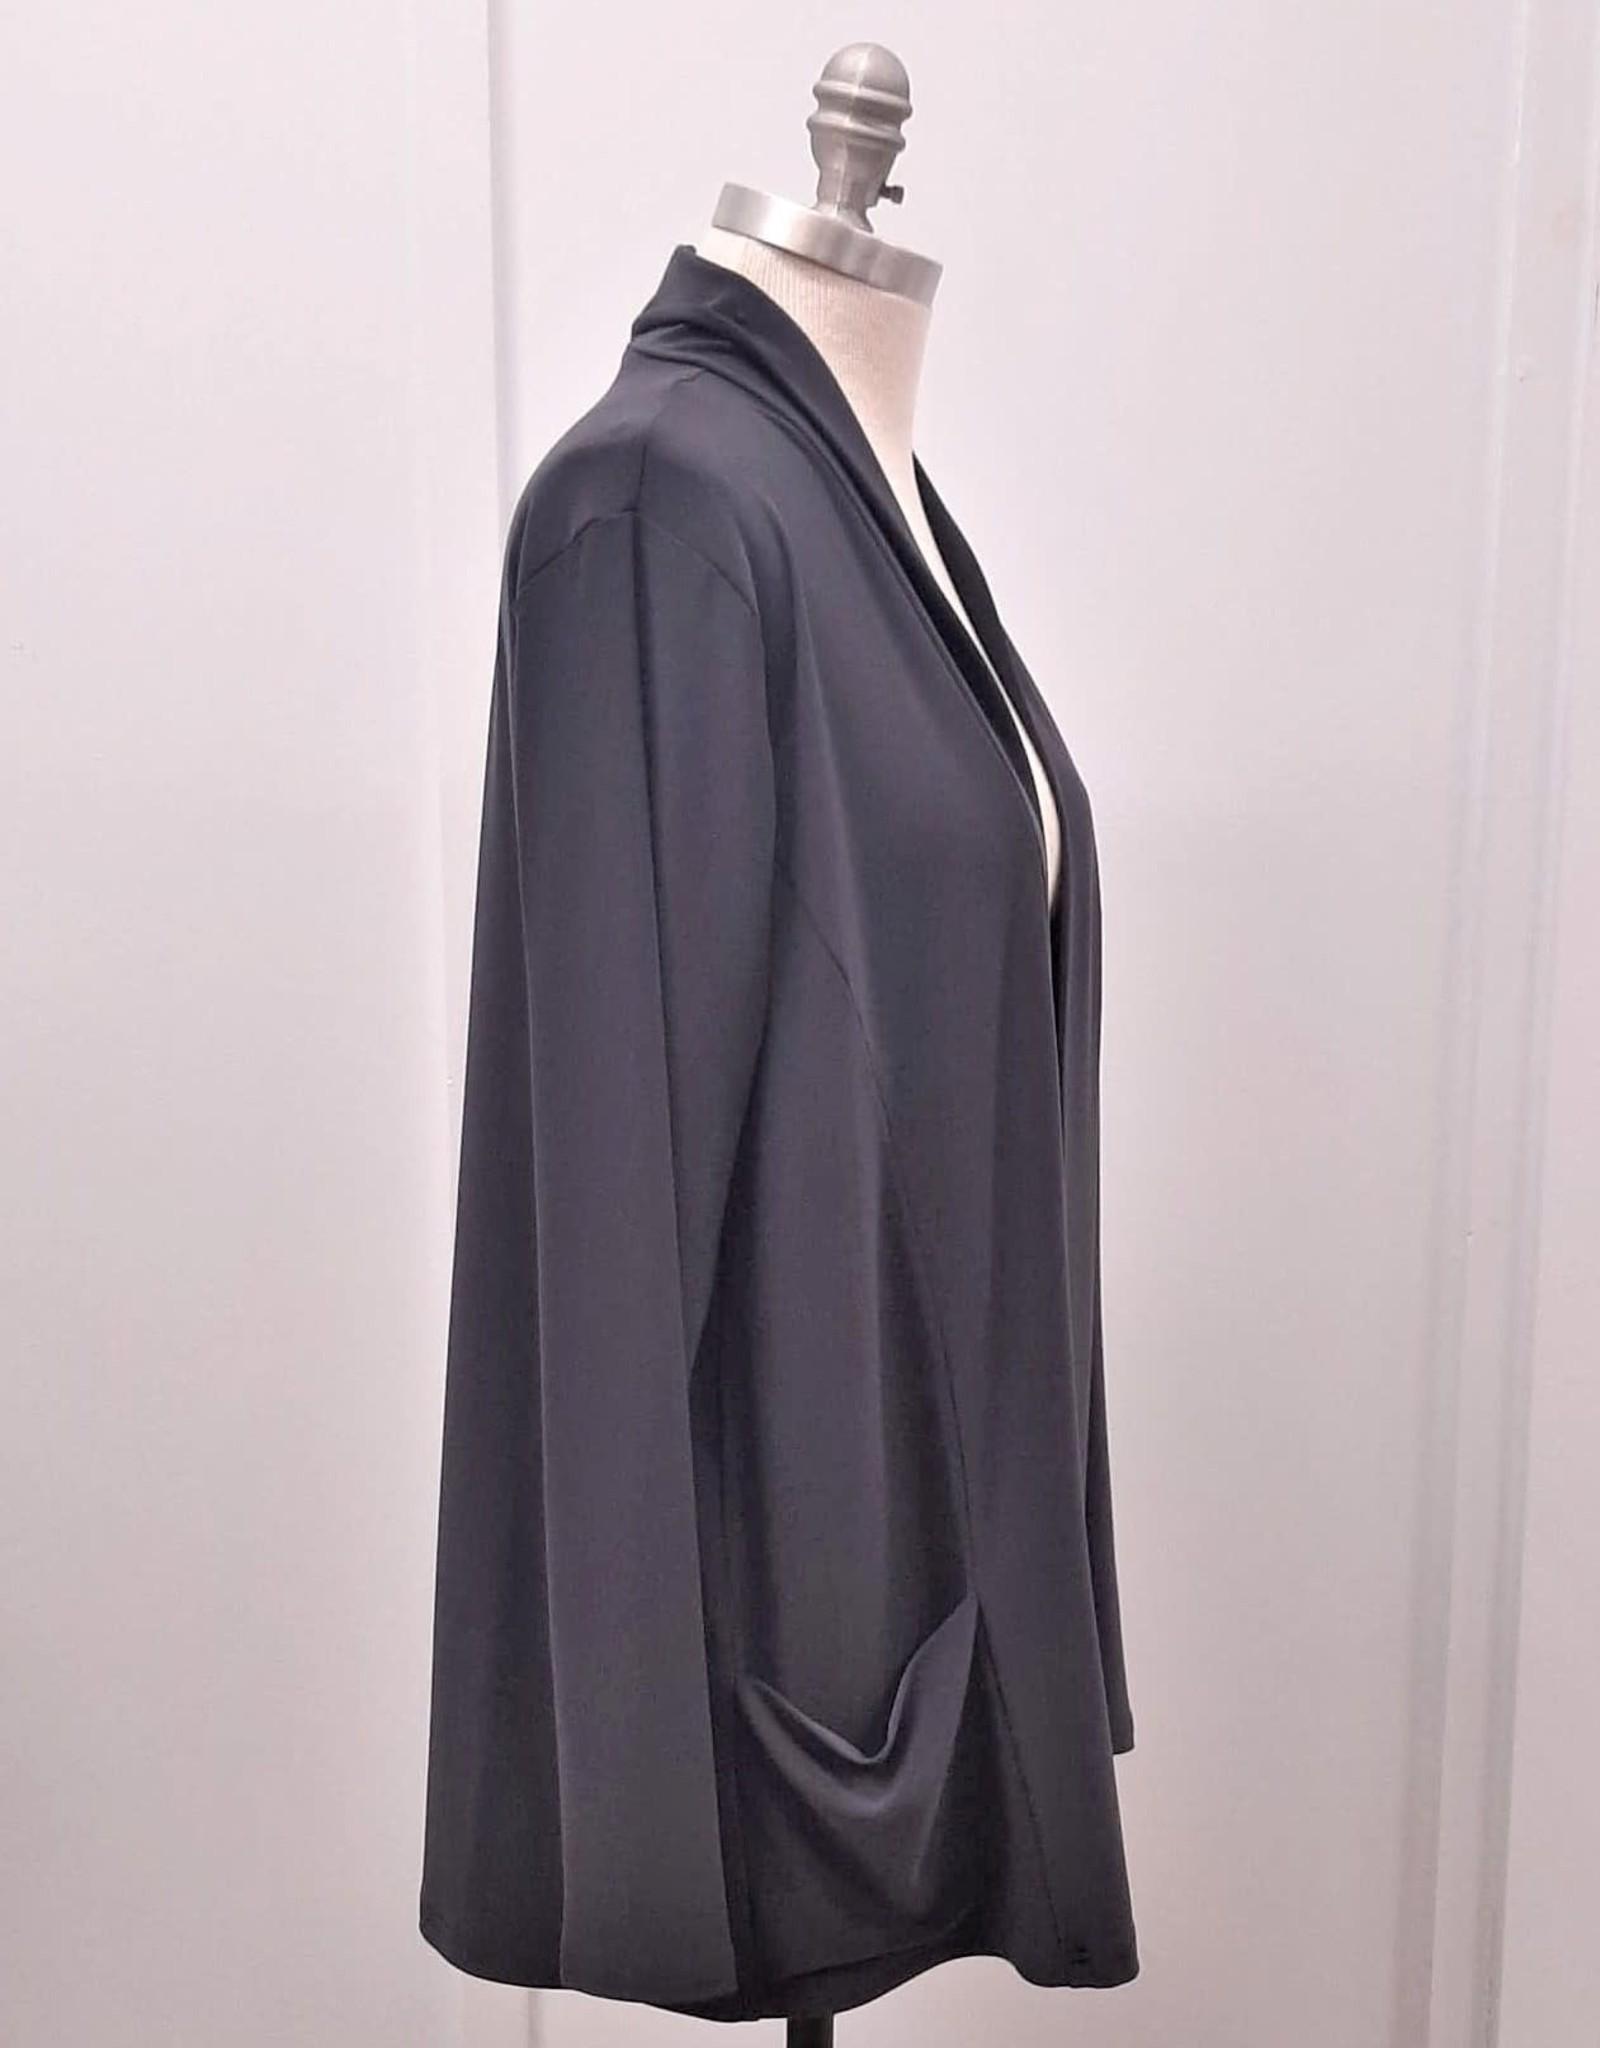 Sympli Go to Cardigan - Size 12 (Consignment)